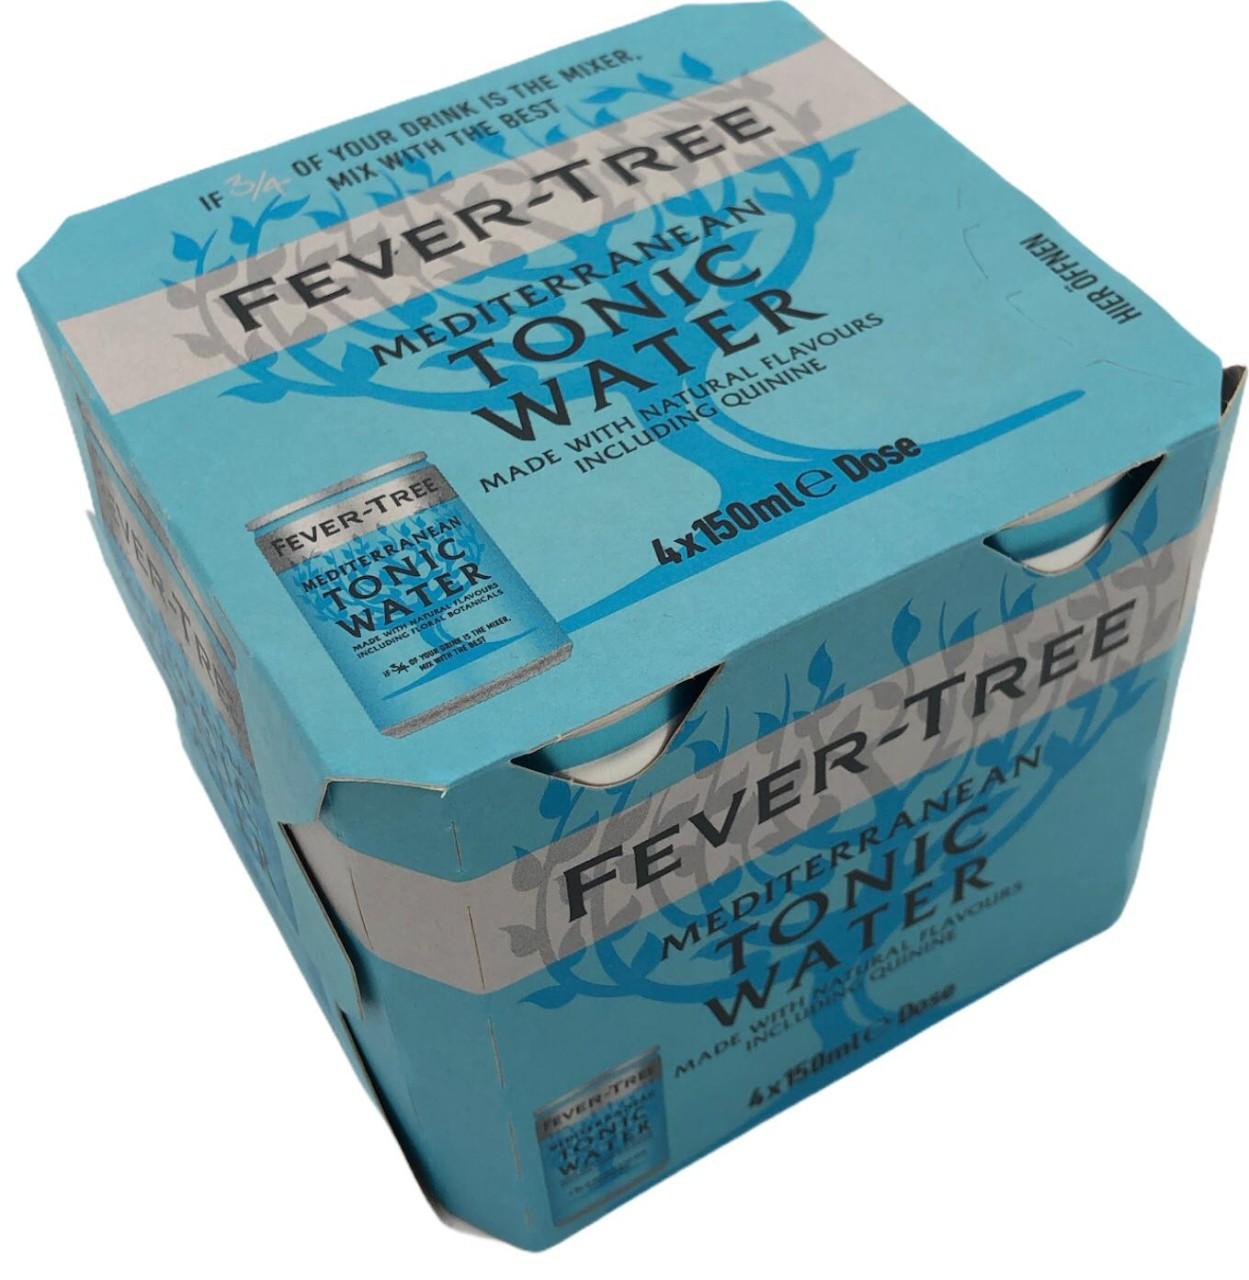 Fever-Tree Mediterranean Tonic in Dose 4x 150ml